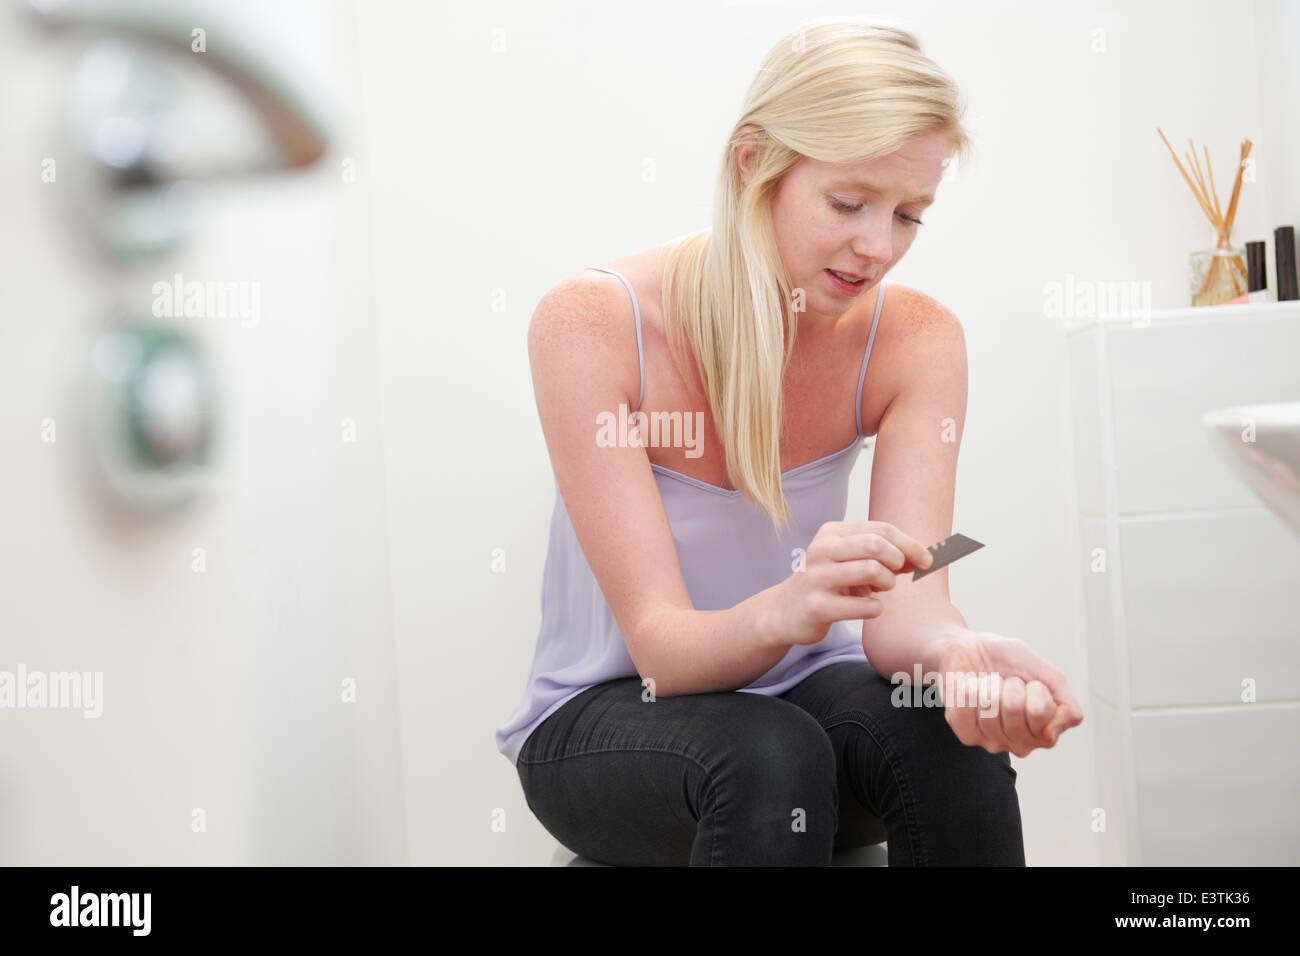 Teenage Girl Self Harming With Knife Blade - Stock Image